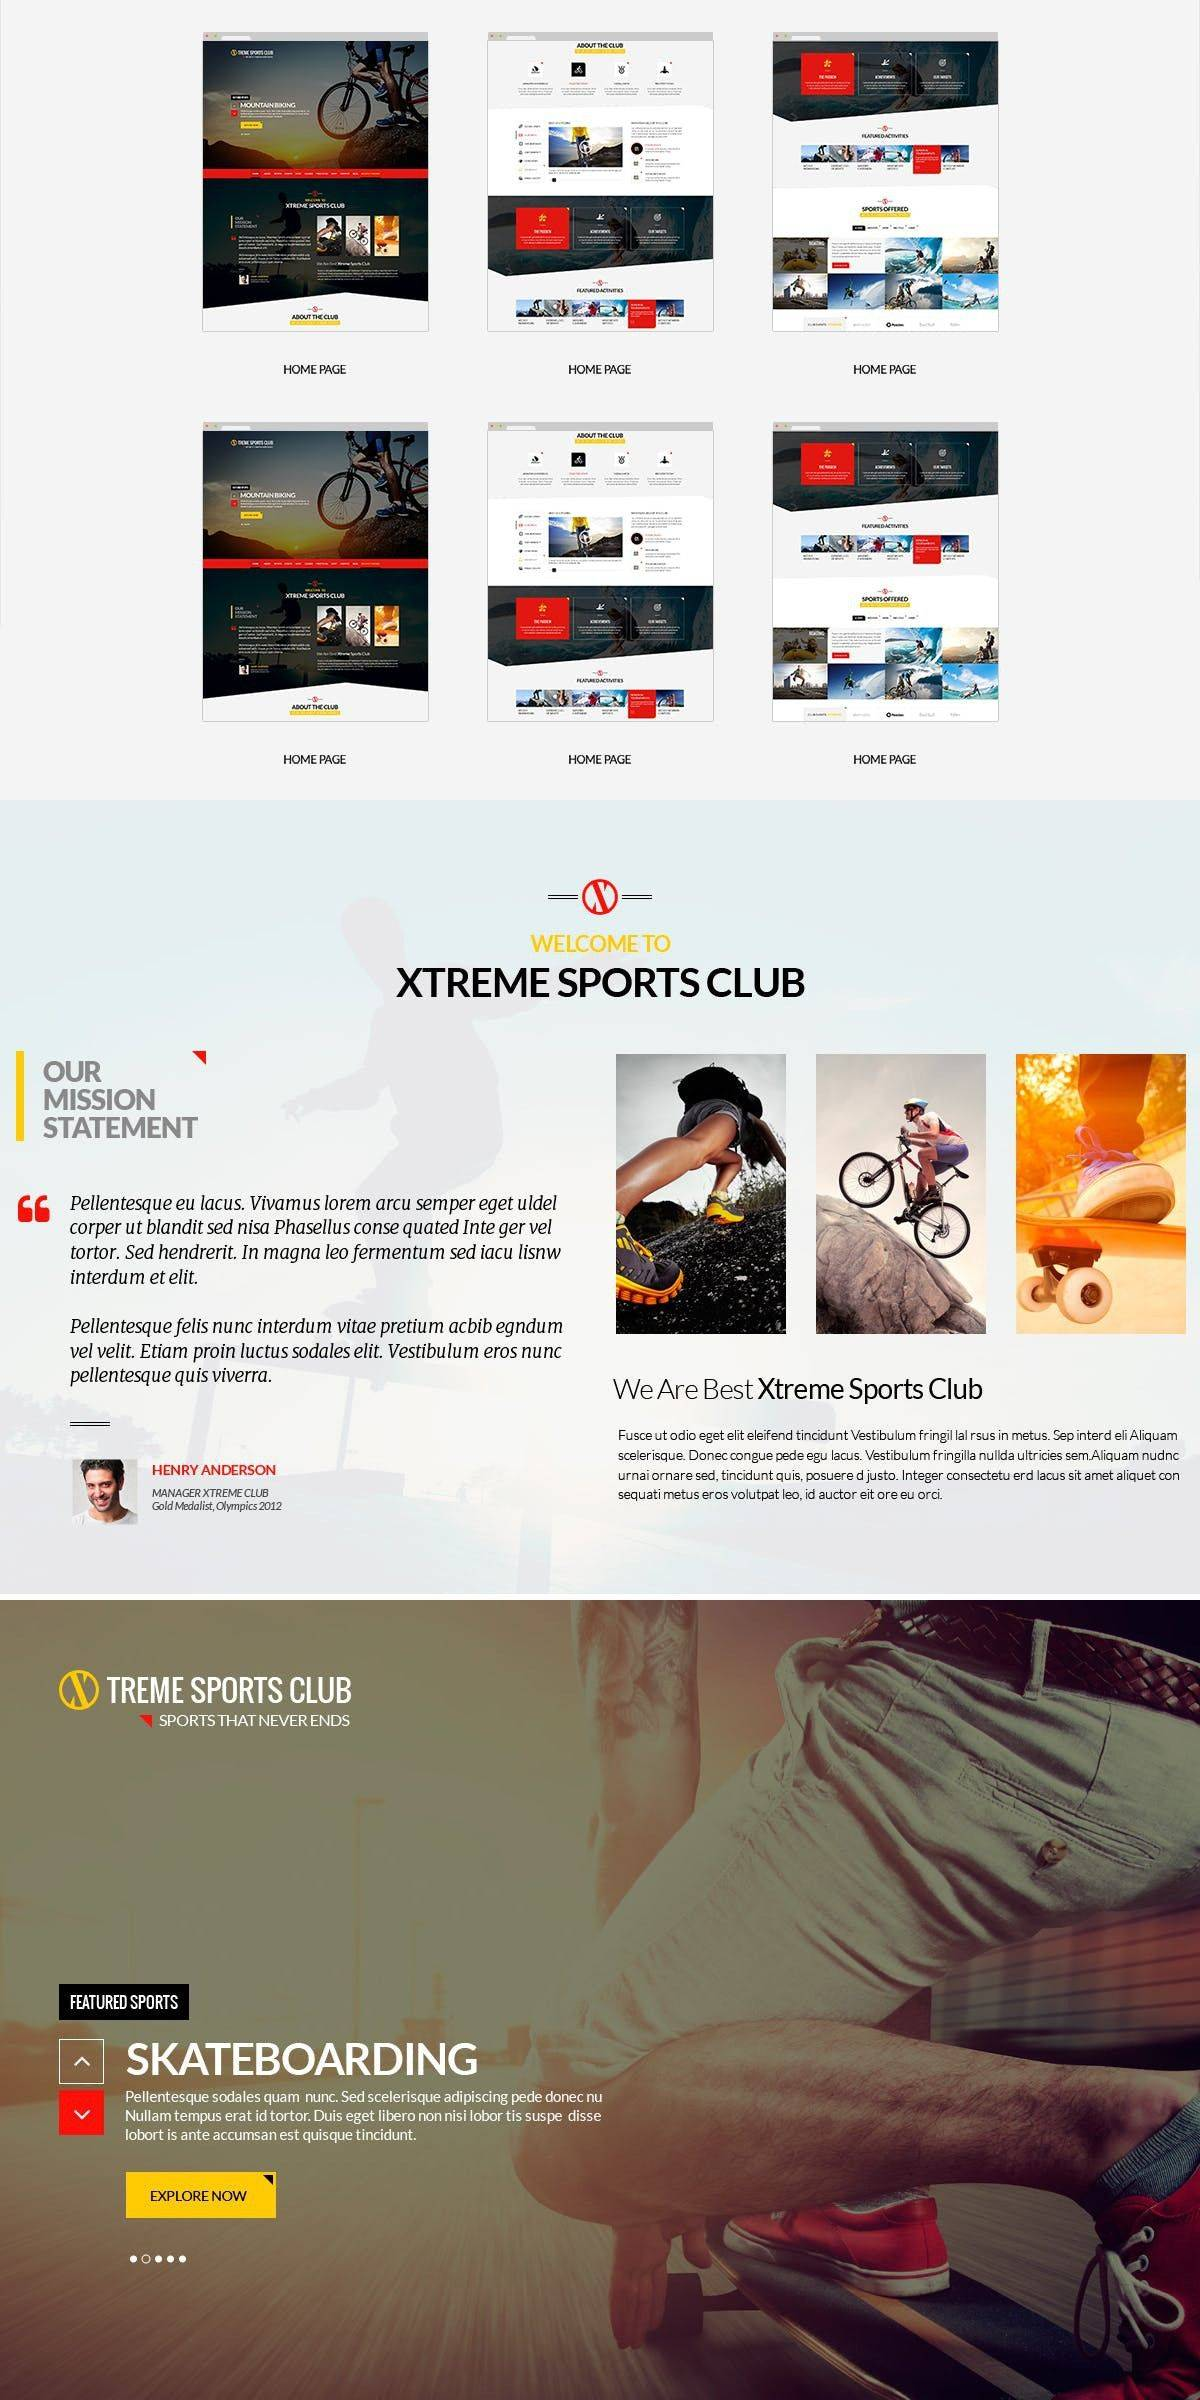 Sports Club Websites Templates